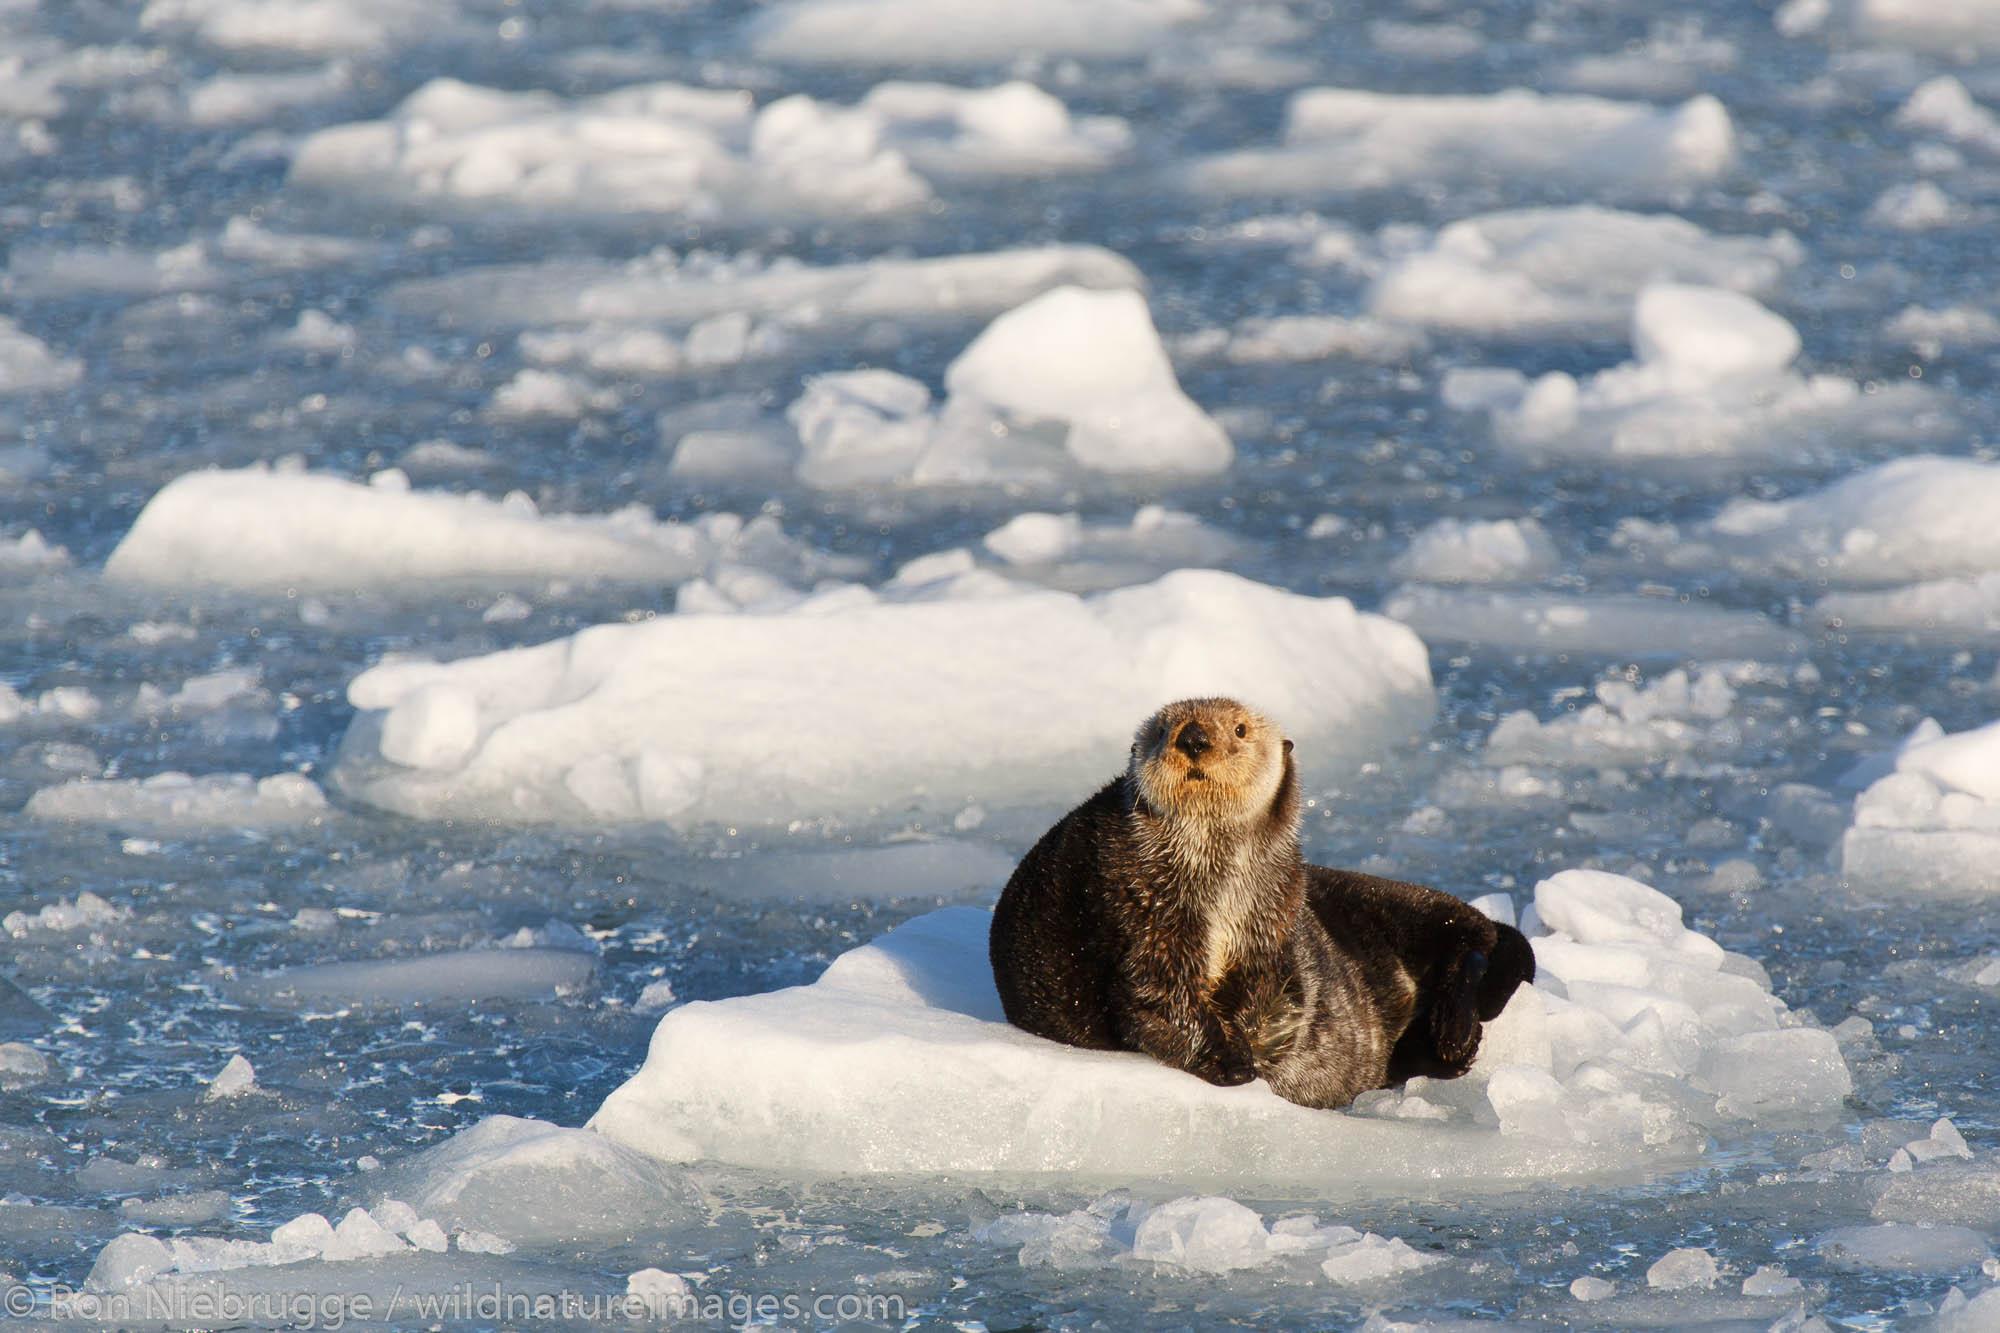 Sea Otter, Harriman Fjord, Prince William Sound, Chugach National Forest, Alaska.